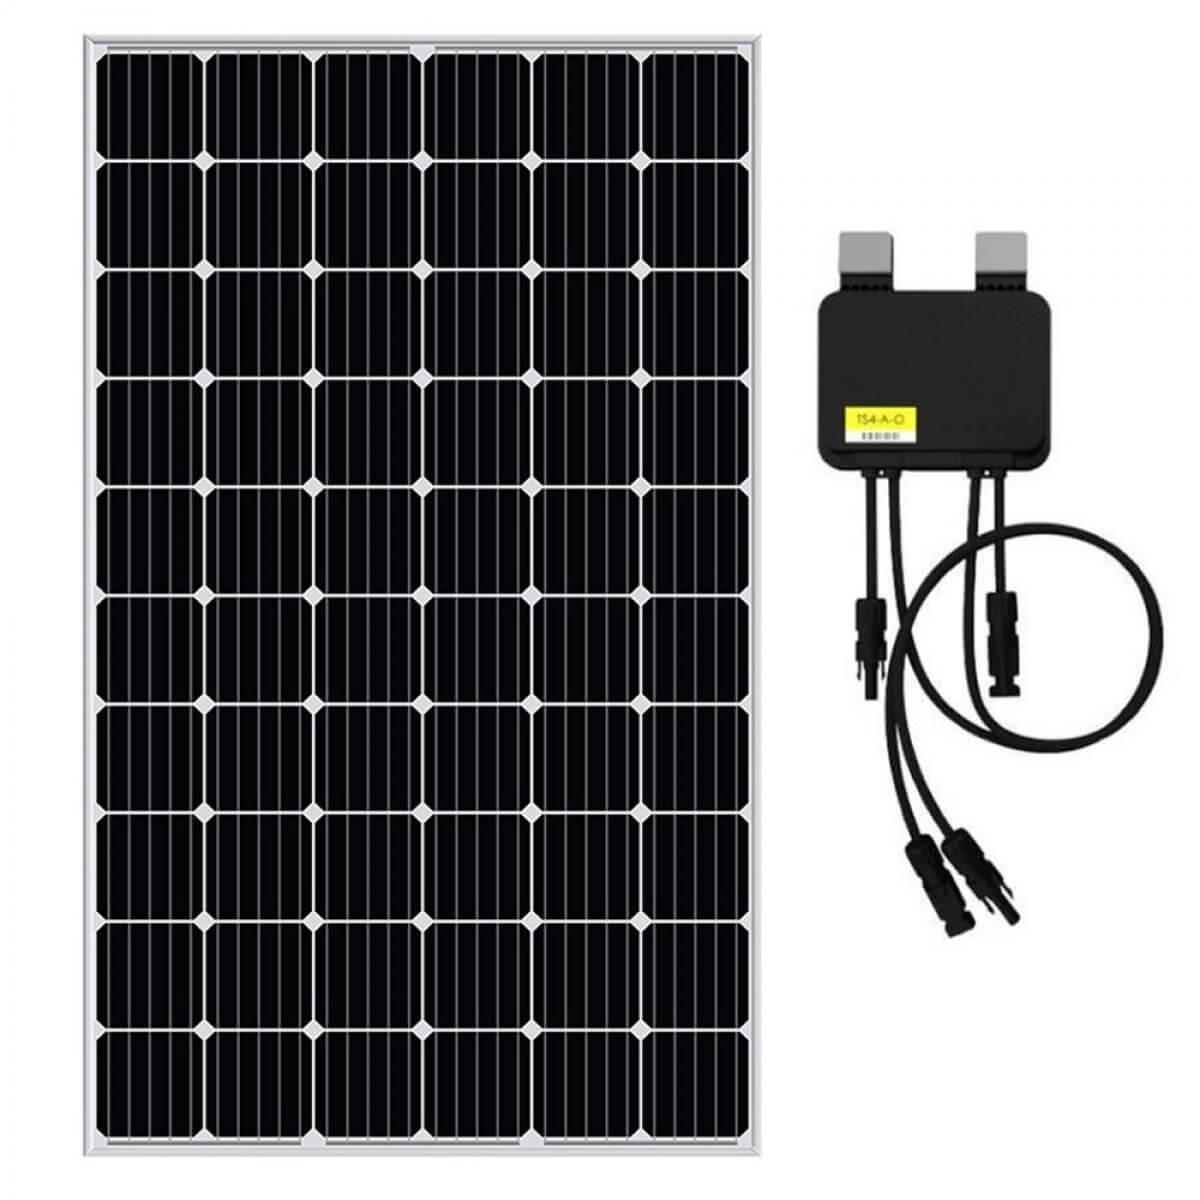 Tigo TS4-A-O-DUO Optimiser for Solar Panels up 700Watt for 1 or 2 PV Modules